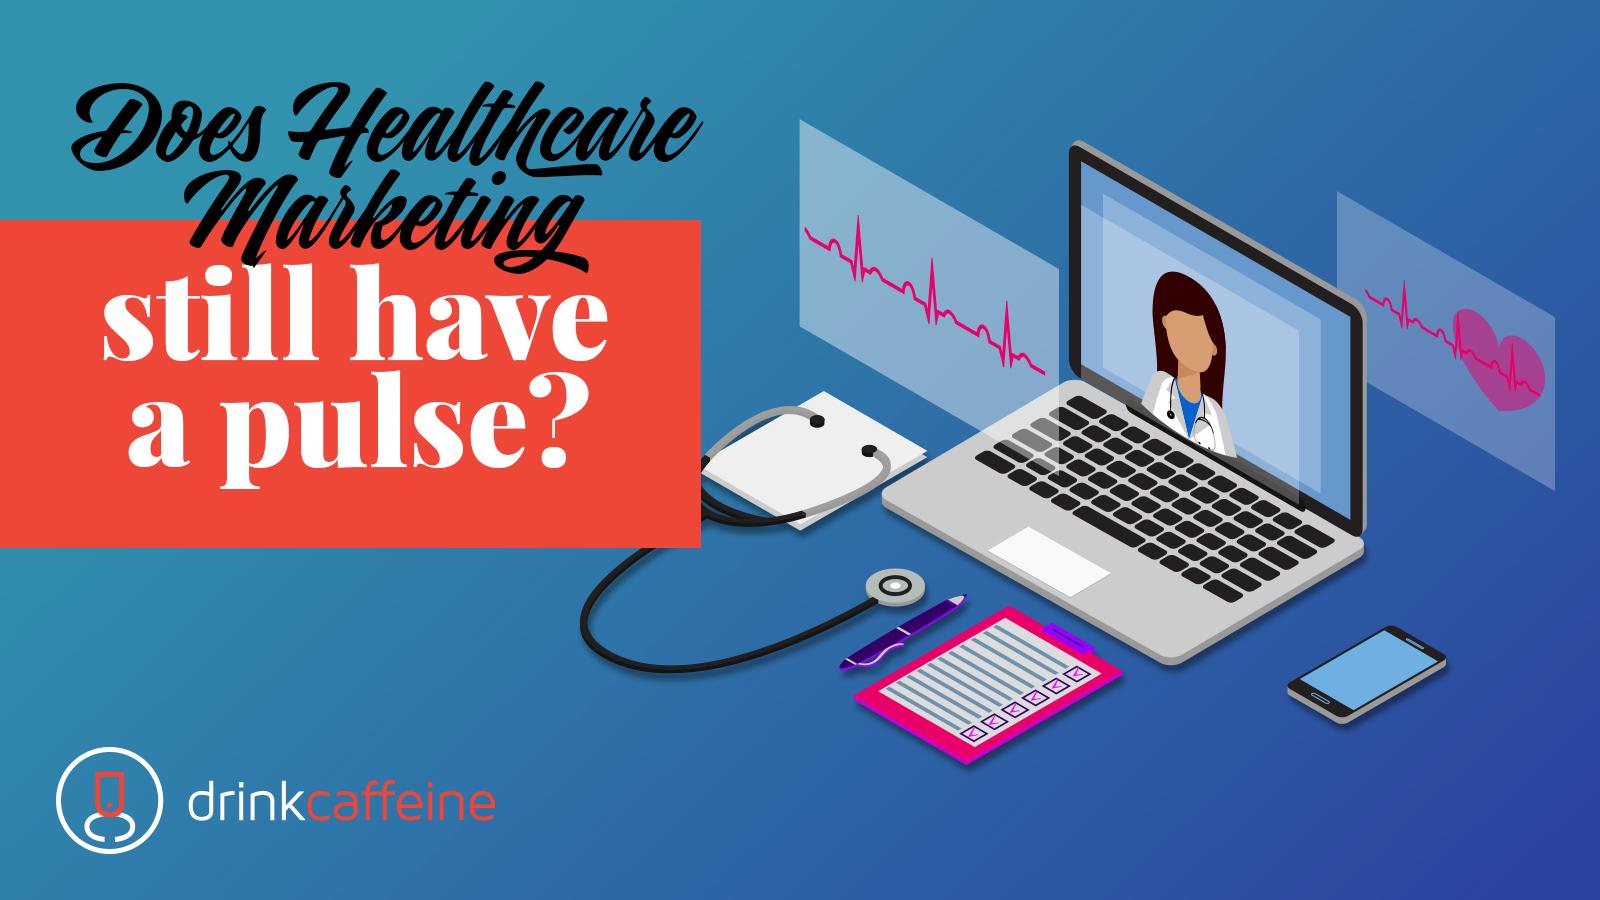 Humanity & Healthcare Marketing 2020 blog image